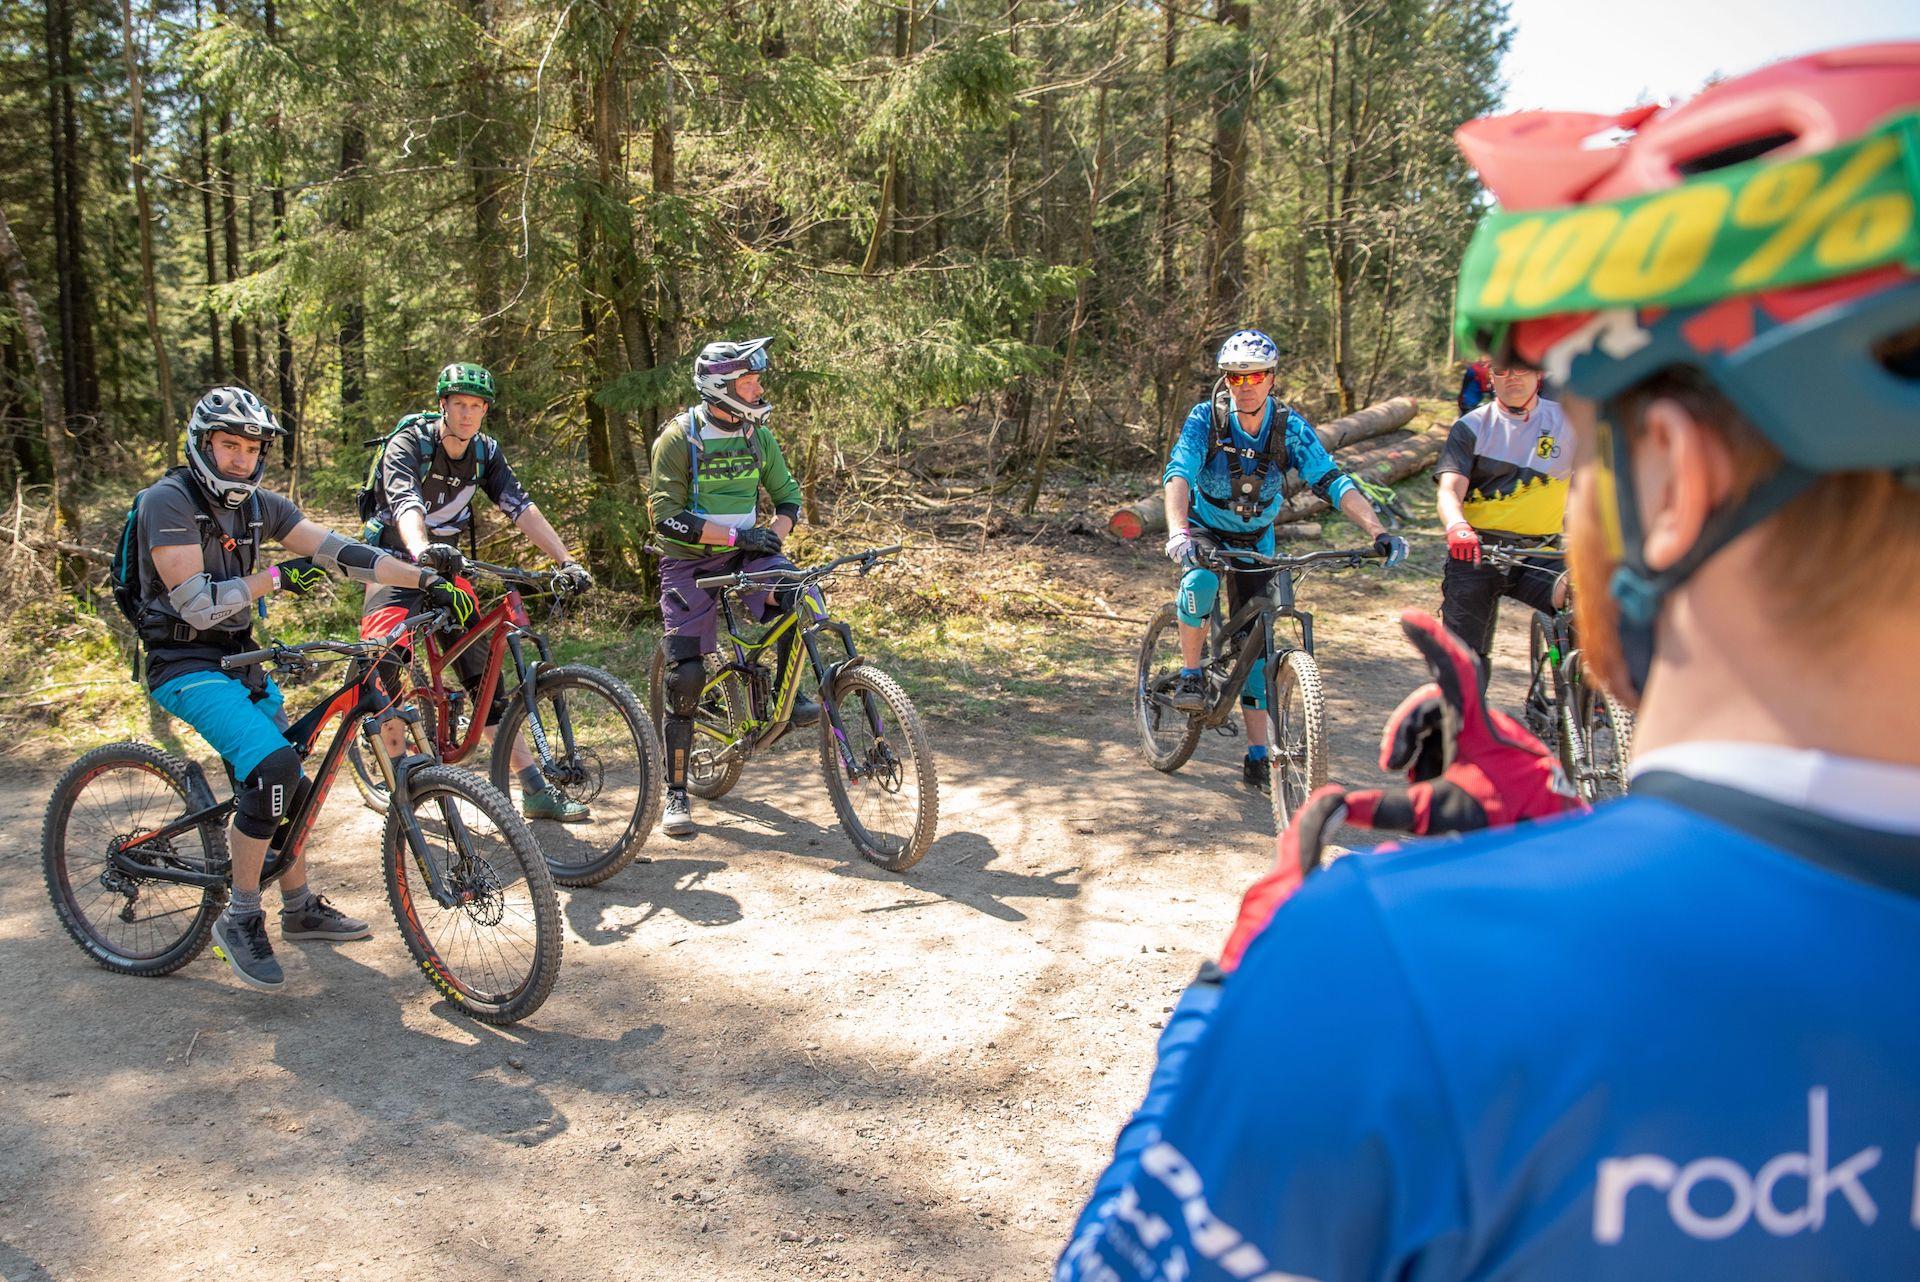 MTB Fahrtechnik Kurse in Saarbrücken Training Einsteiger Fortgeschritten Experten Kinder Rock my Trail Bikeschule -1